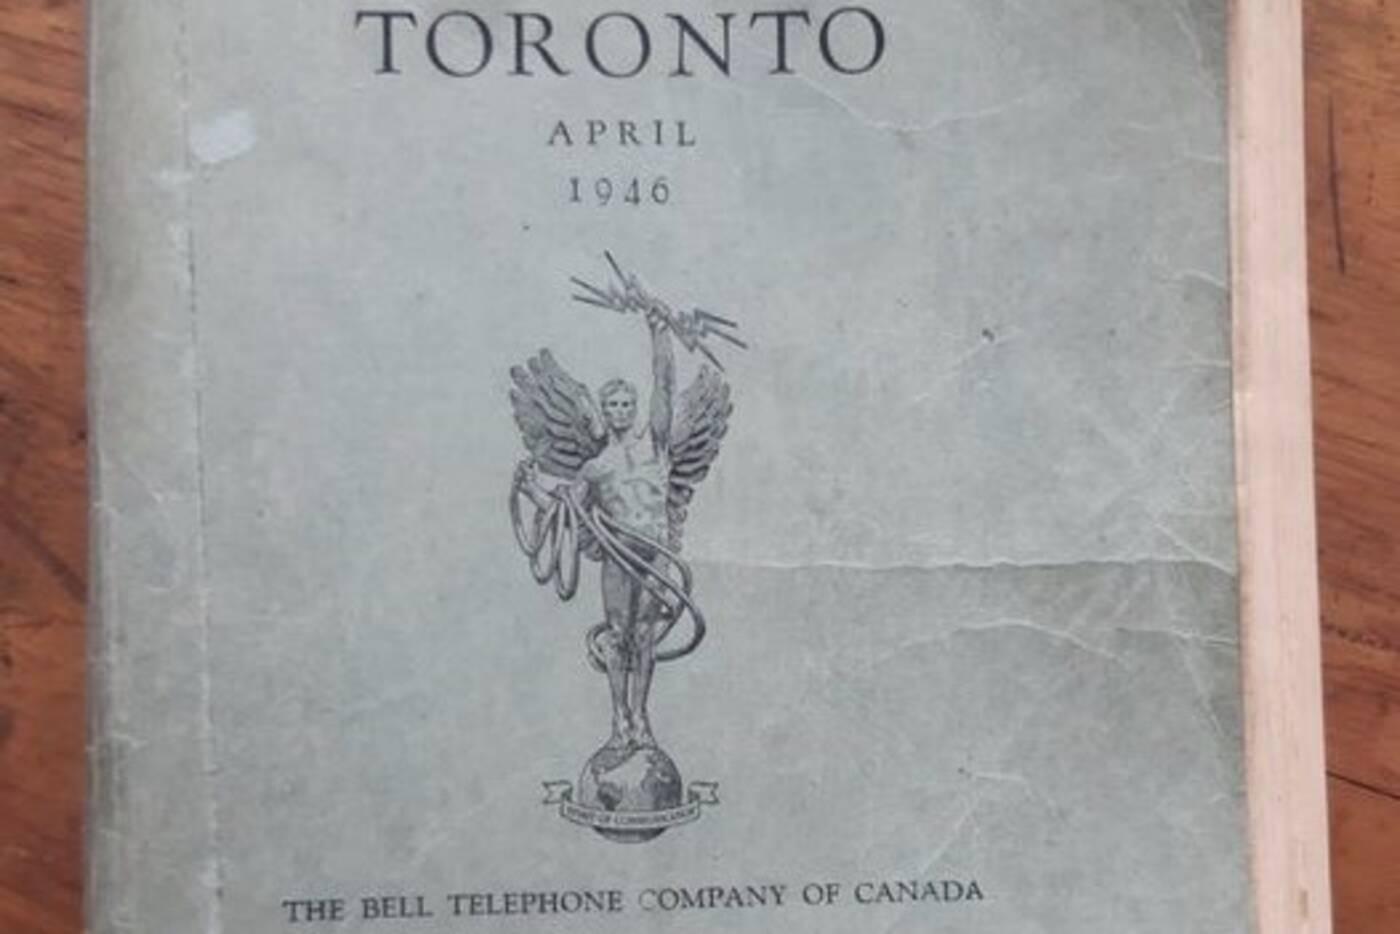 1946 toronto phonebook